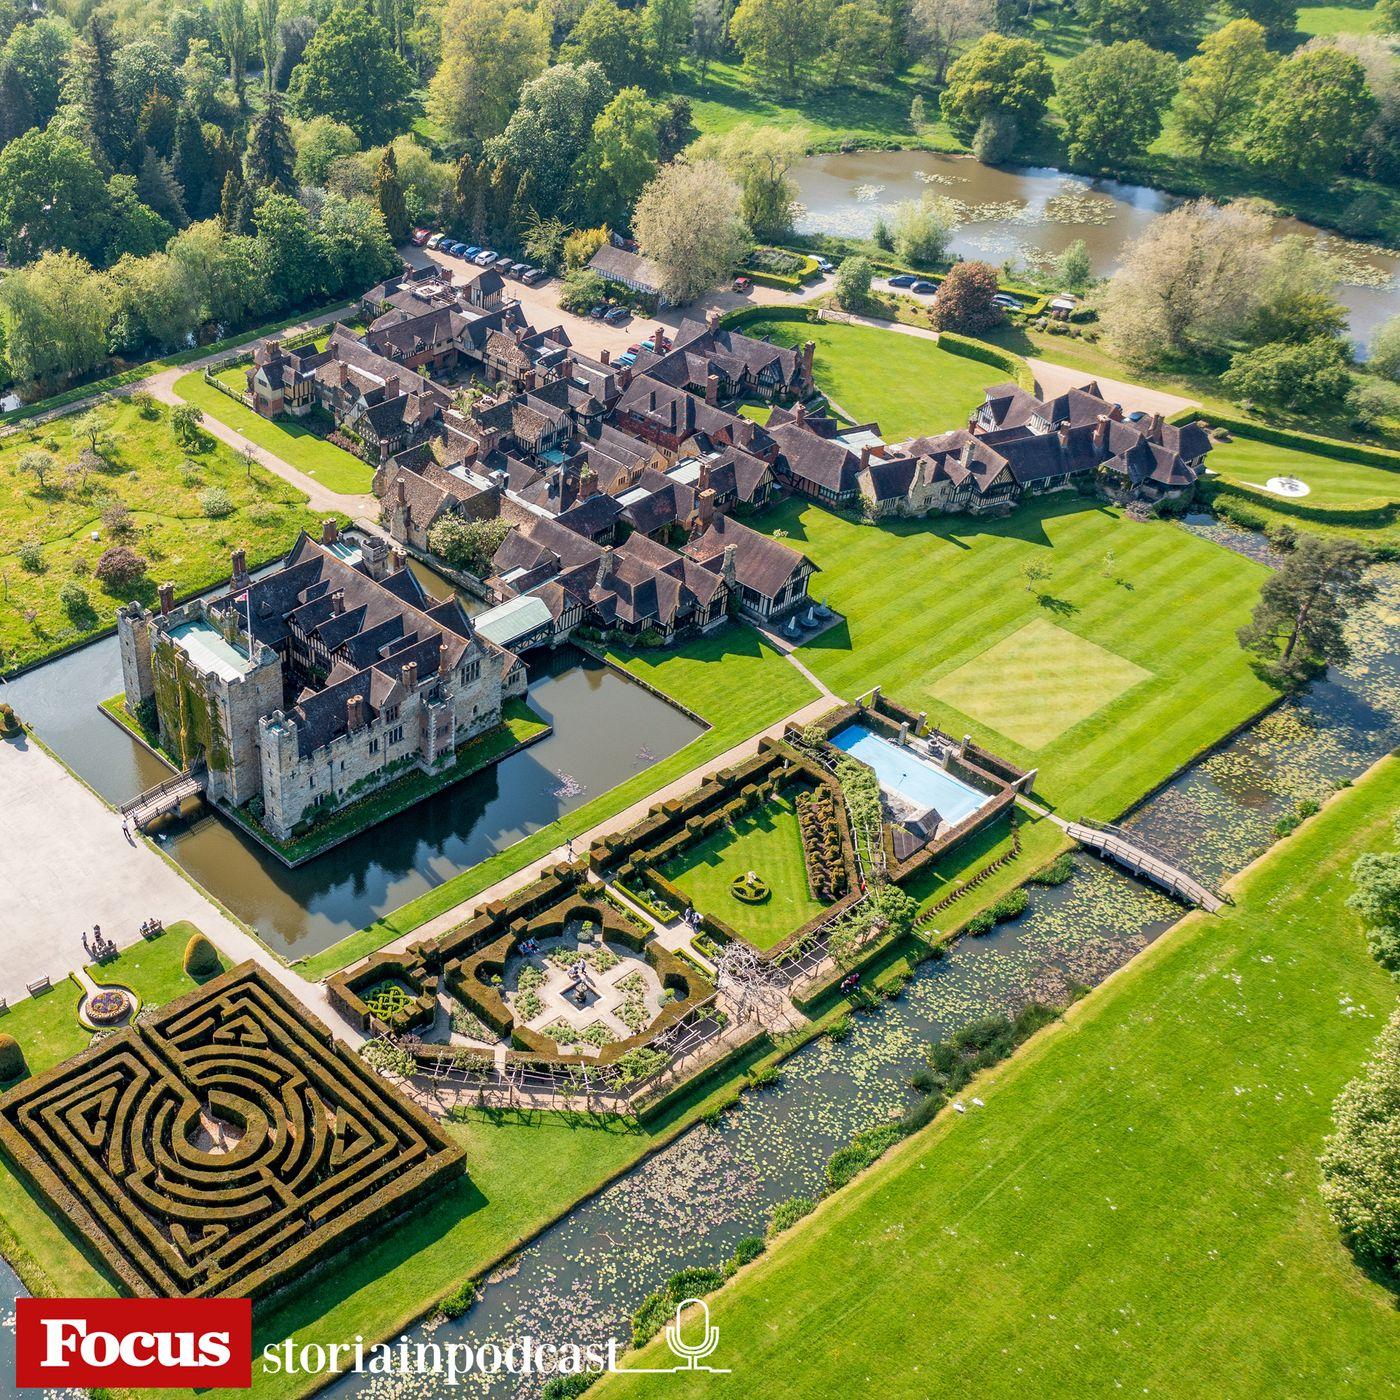 L'Inghilterra dai Tudor agli Stuart - Quarta parte